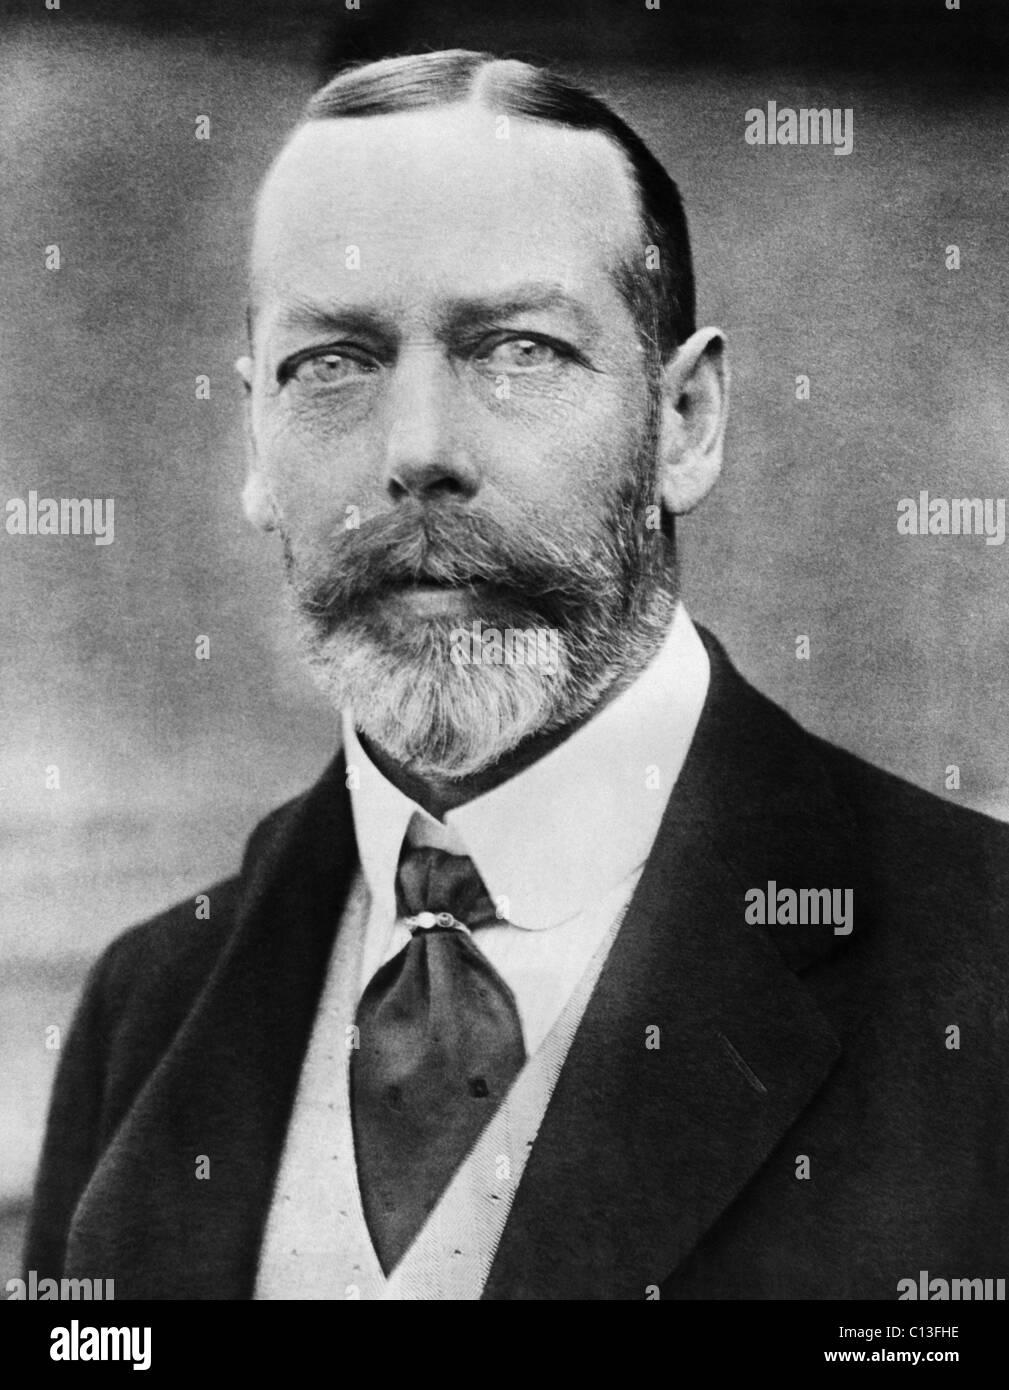 British Royalty King George V Of England Circa 1920s